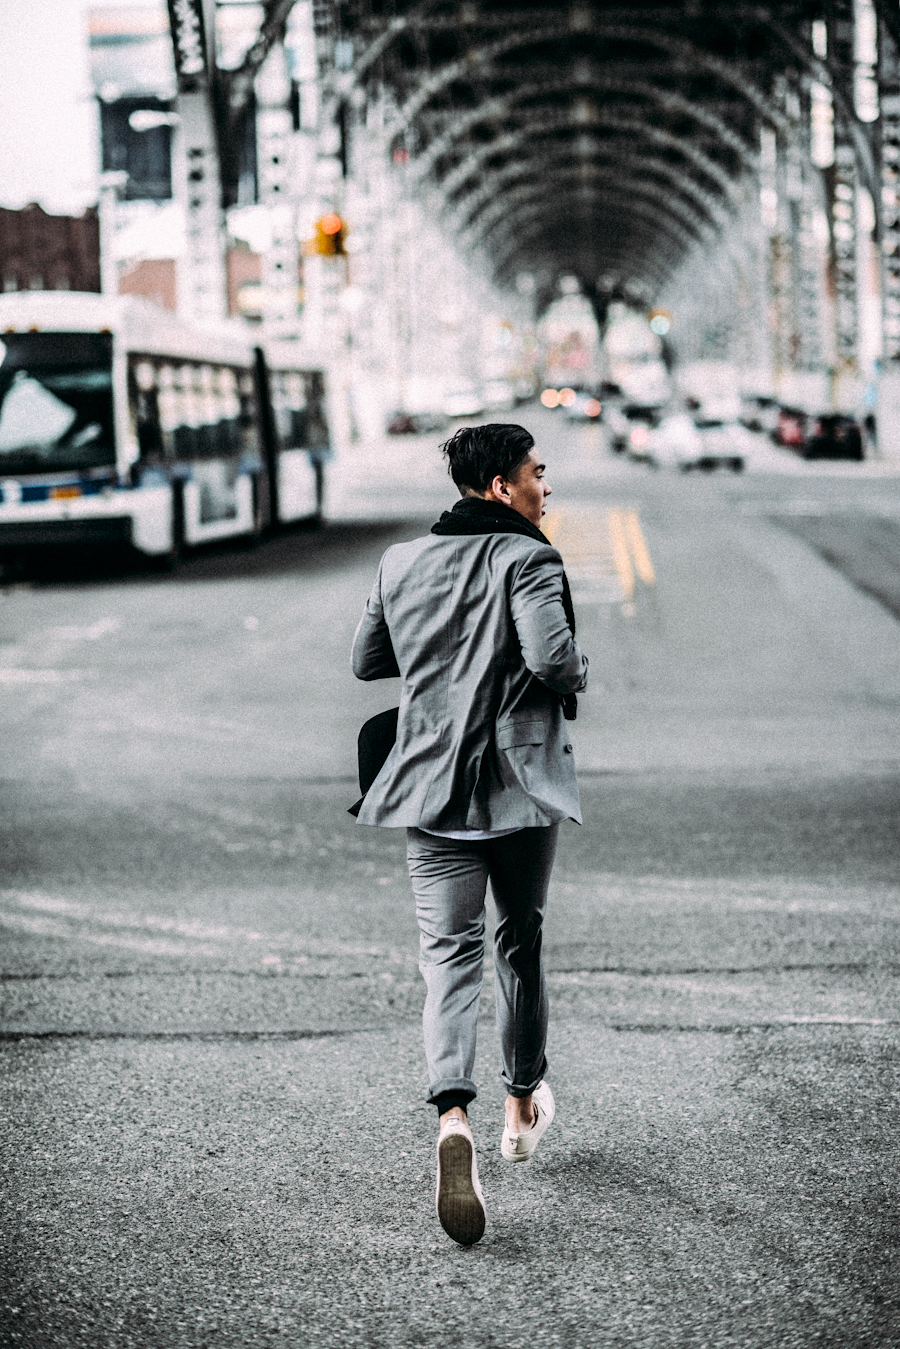 Structured-@CombatGent-@DapperLou-Menswear-Blog-#StreetStyle-6.jpg